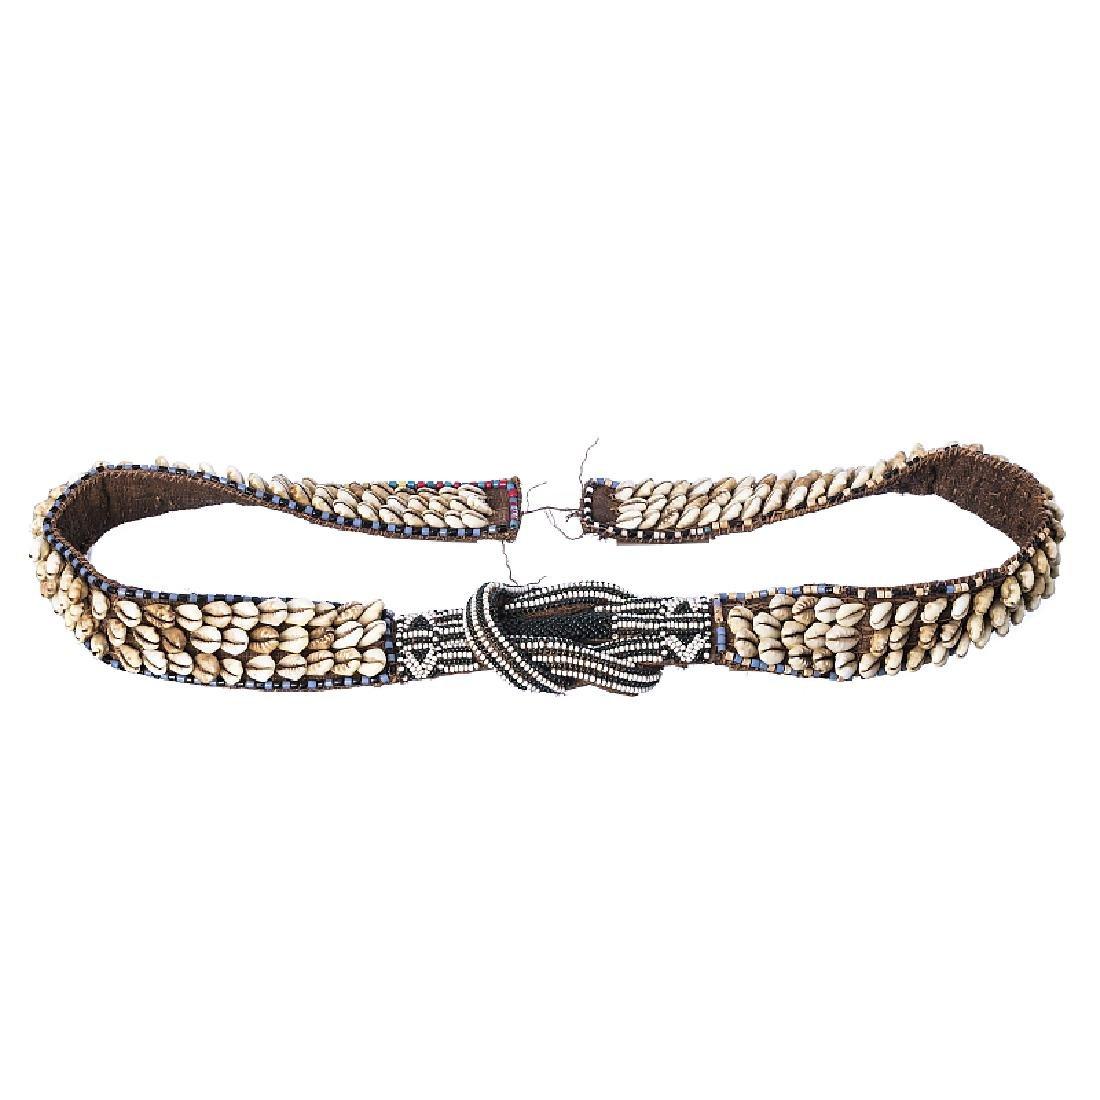 KUBA - Adornment / Belt with Cauri